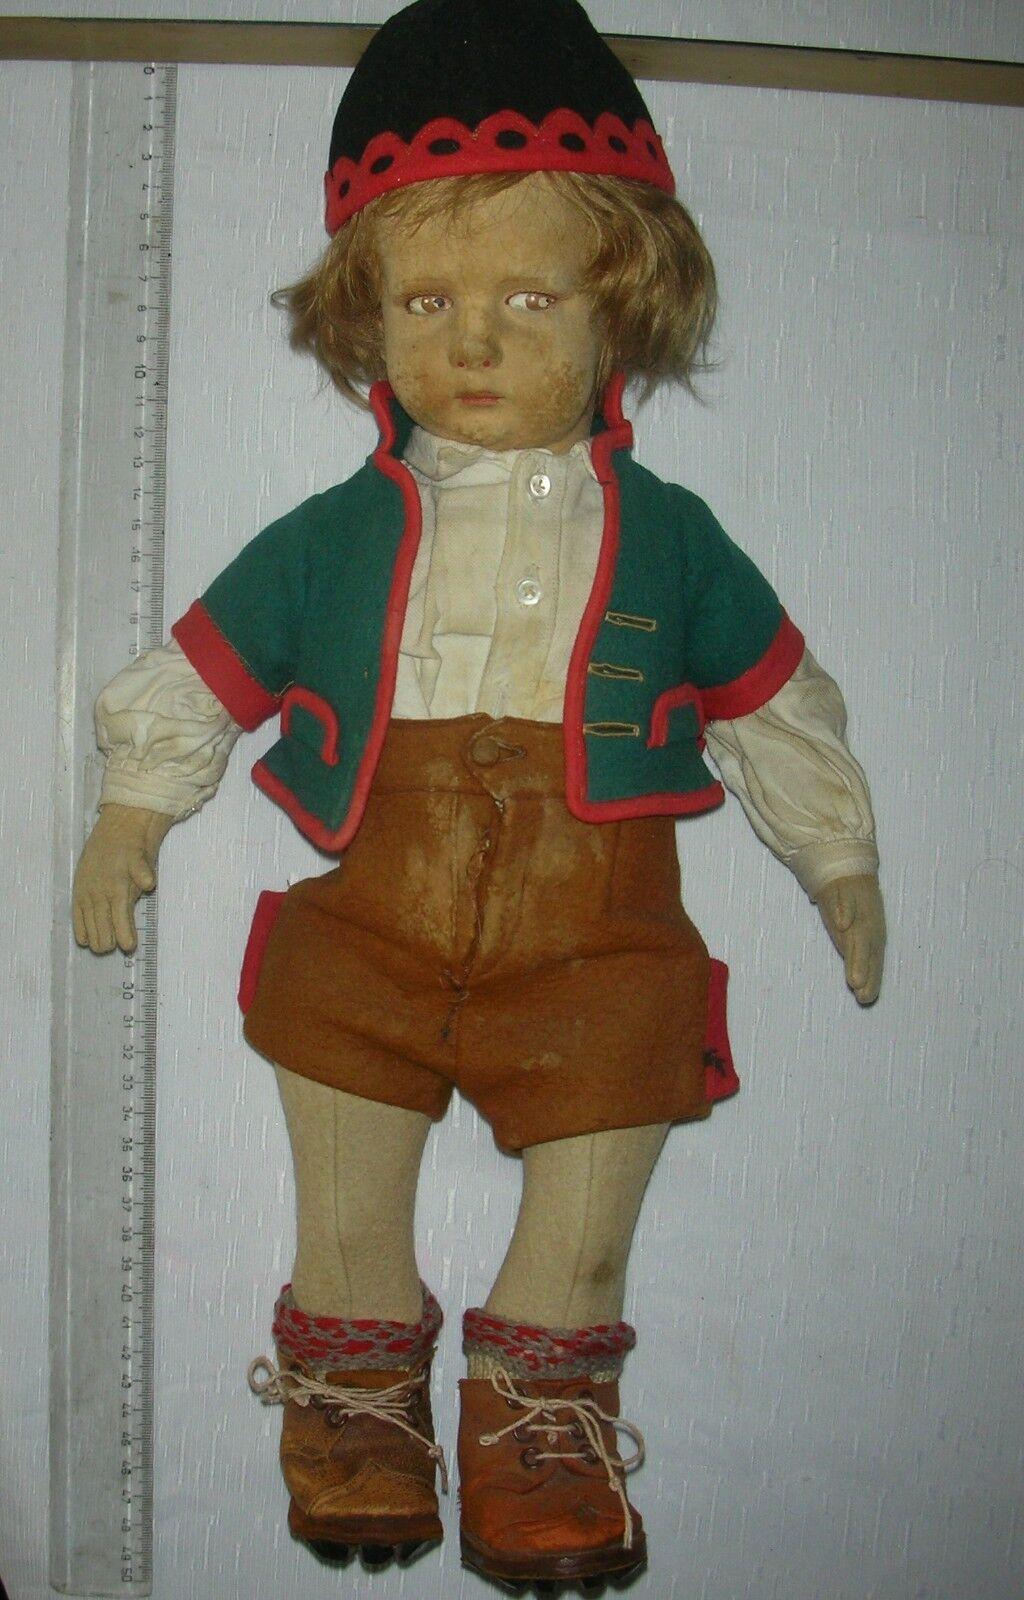 Paño italiano carácter Swiss Boy Lenci Muñeca BAMBOLA serie 300 43cm Original